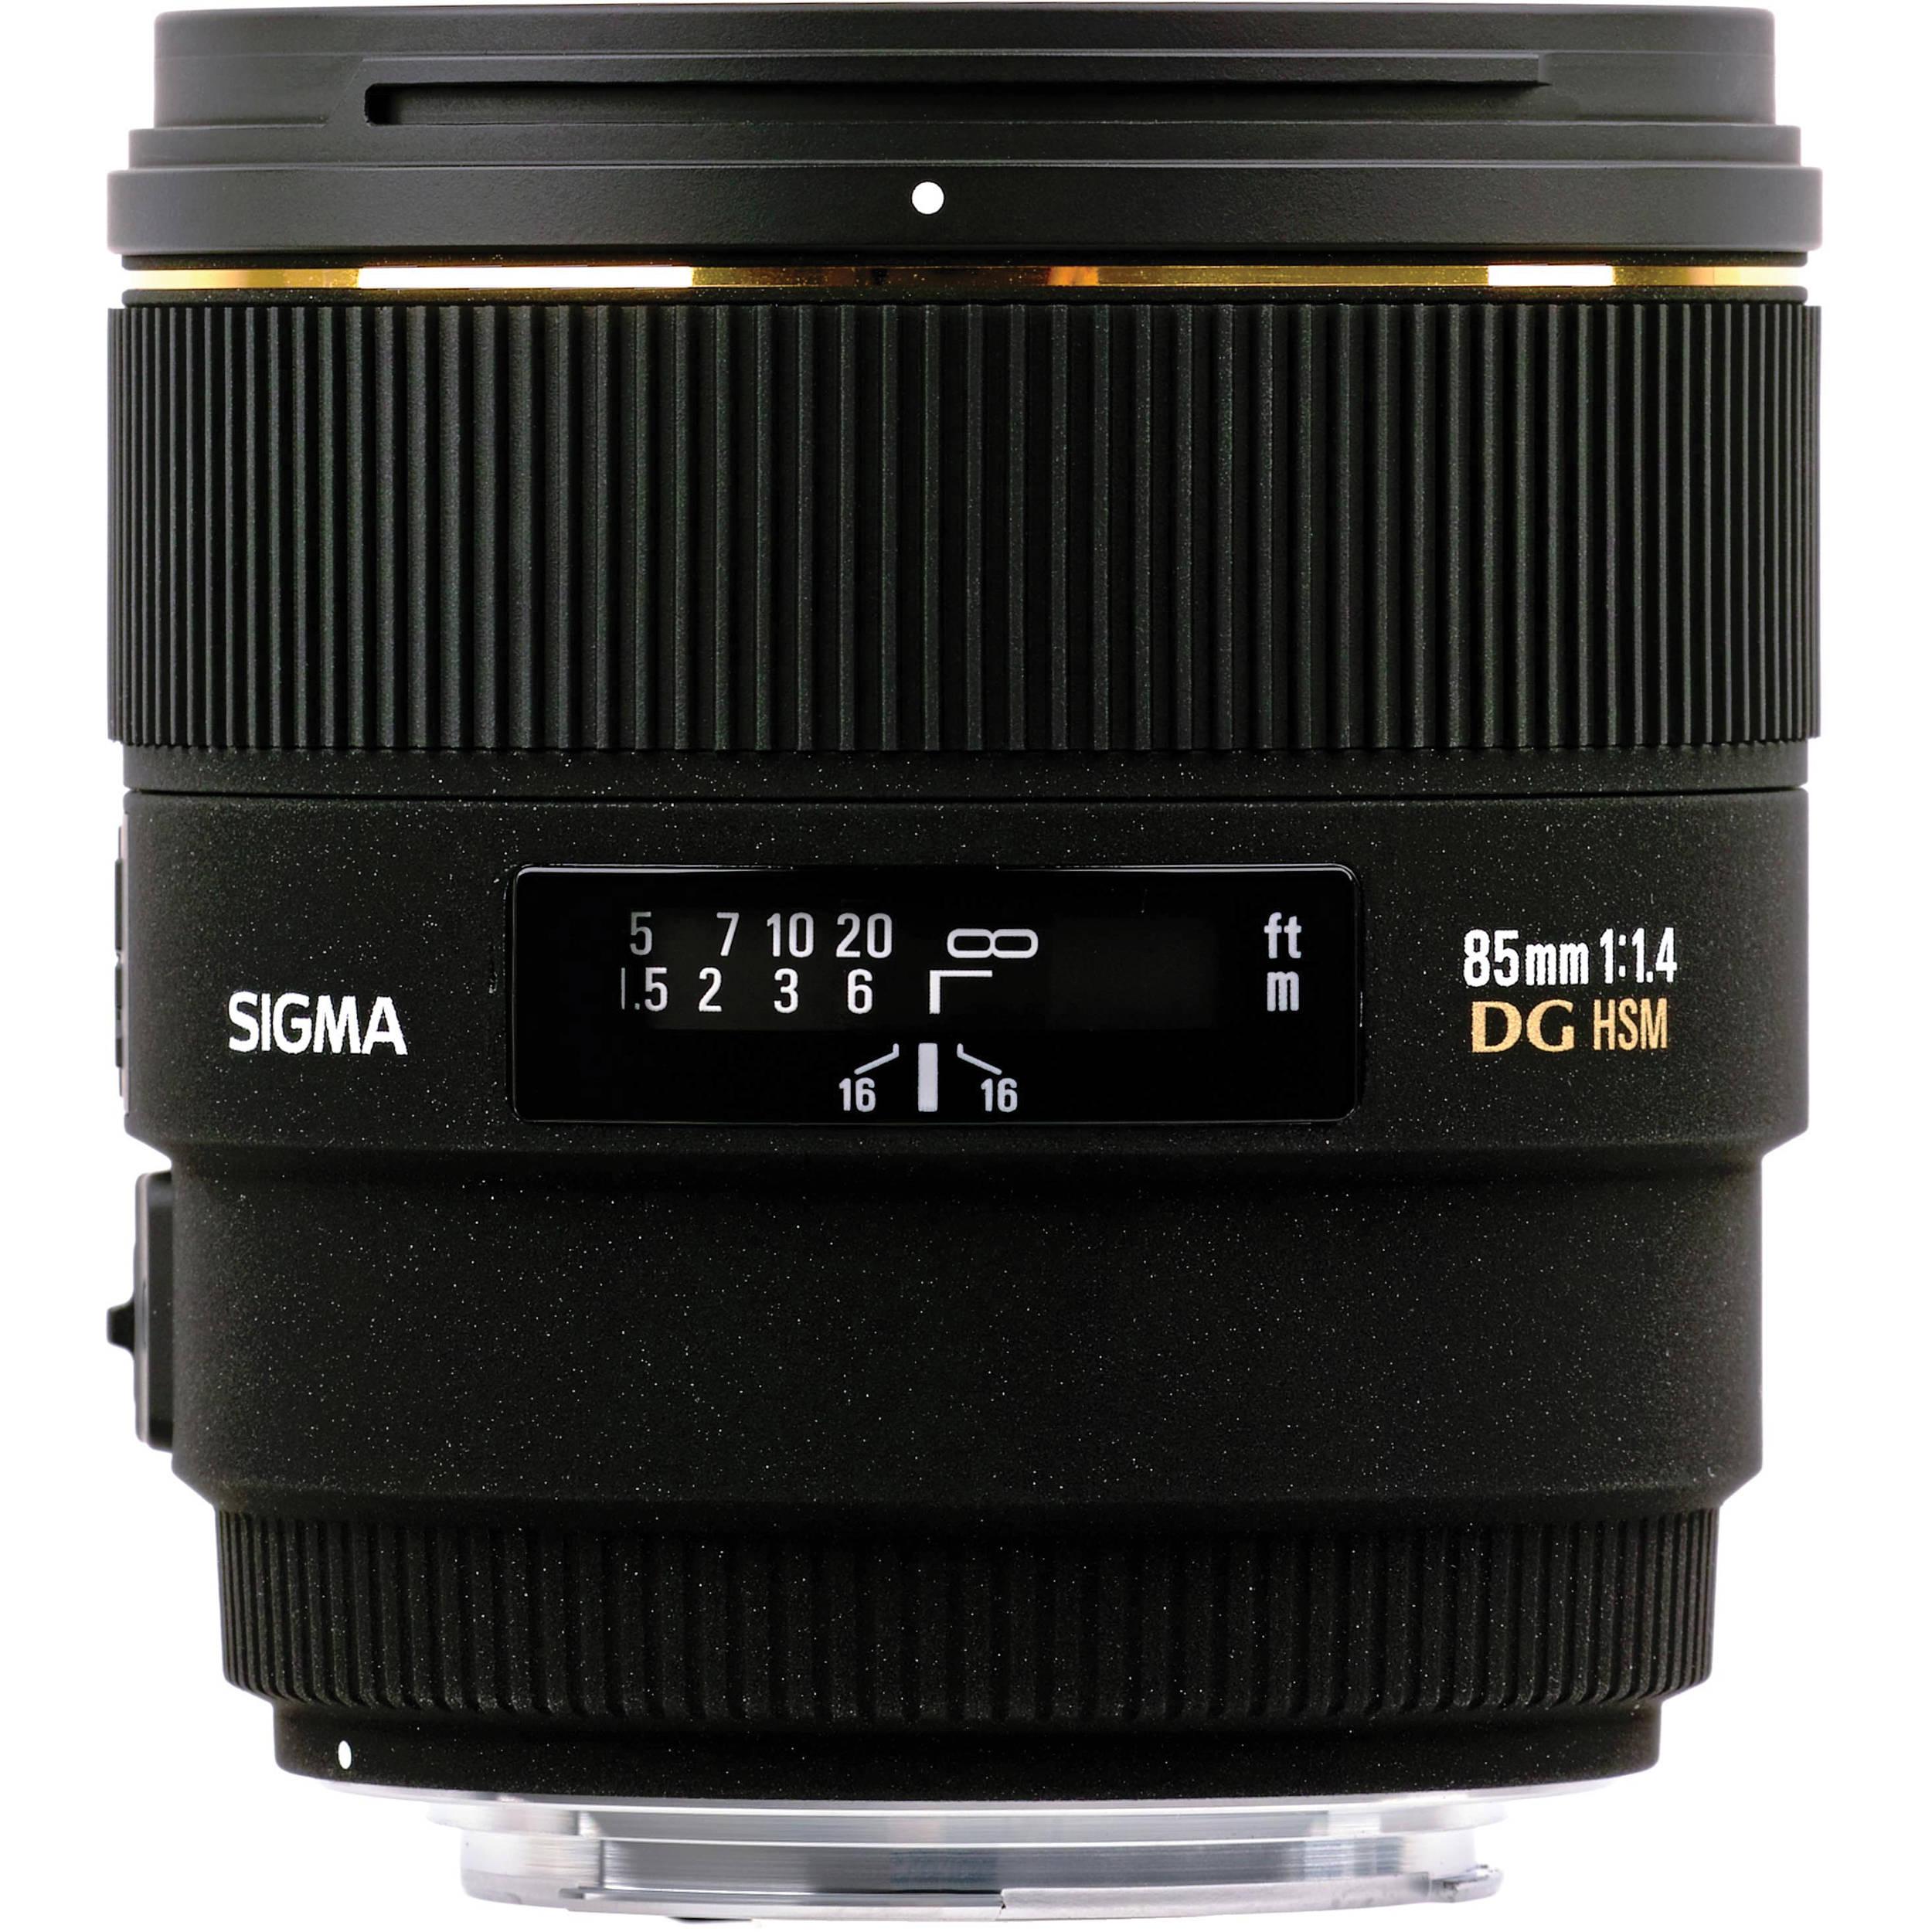 Sigma's 85mm f/1.4 DG HSM lens